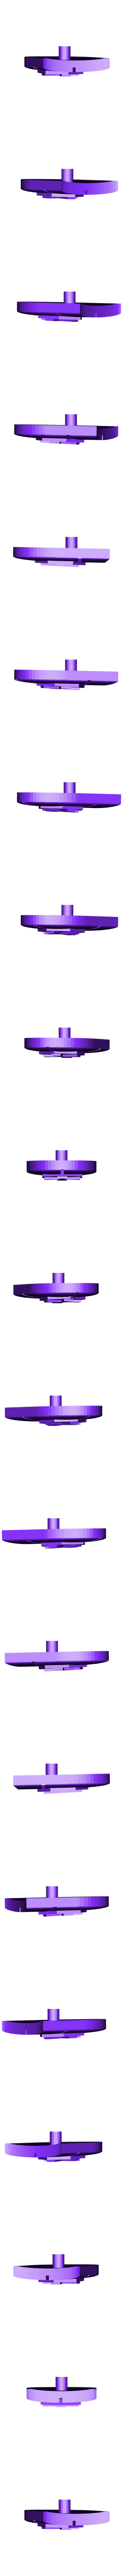 Royal_Shield.stl Download free STL file Modular Linebacker Mech • 3D printing object, mrhers2